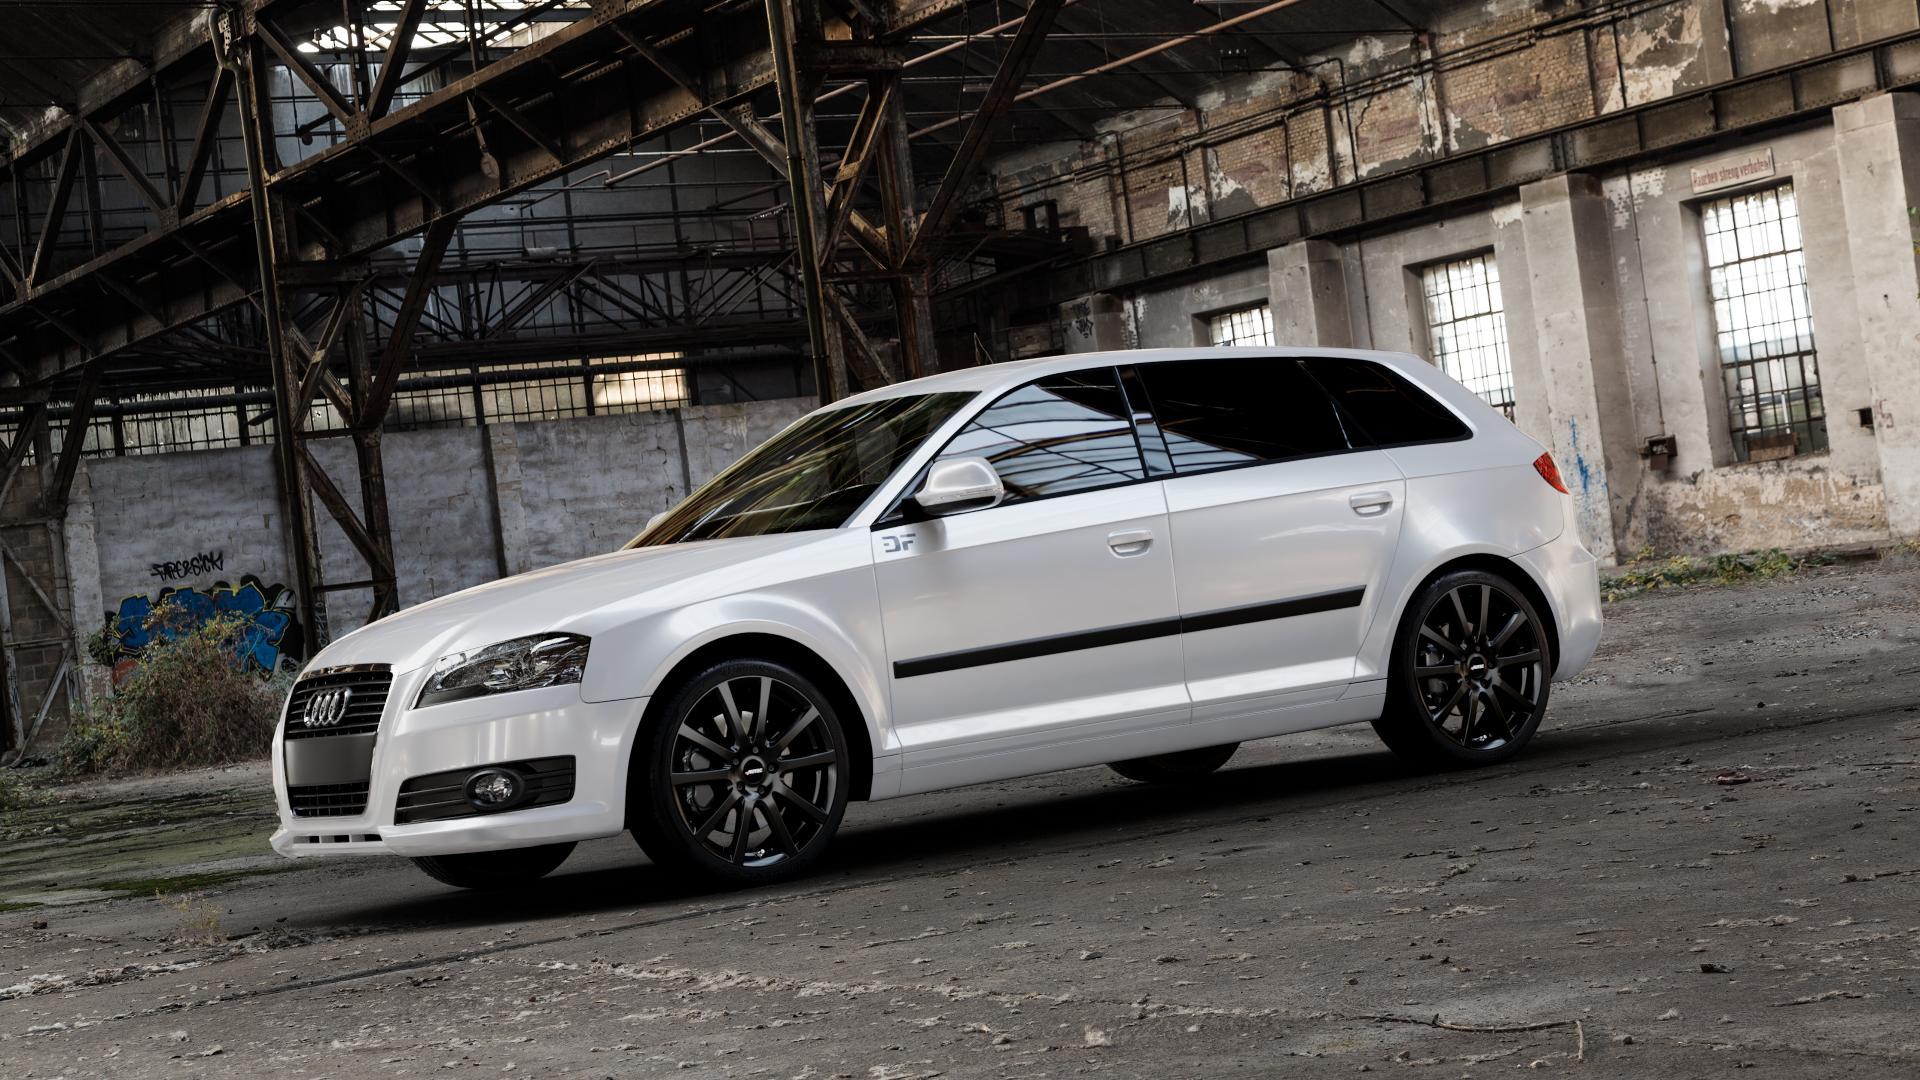 AUTEC Skandic Schwarz matt Felge mit Reifen in 18Zoll Winterfelge Alufelge auf weissem Audi A3 Typ 8P (Sportback) 1,6l 75kW (102 PS) 2,0l FSI 110kW (150 1,9l TDI 77kW (105 103kW (140 TFSI 147kW (200 85kW (116 100kW (136 1,8l 118kW (160 125kW (170 1,4l 92kW (125 120kW (163 quattro 3,2l V6 184kW (250 S3 195kW (265 1,2l 66kW (90 18